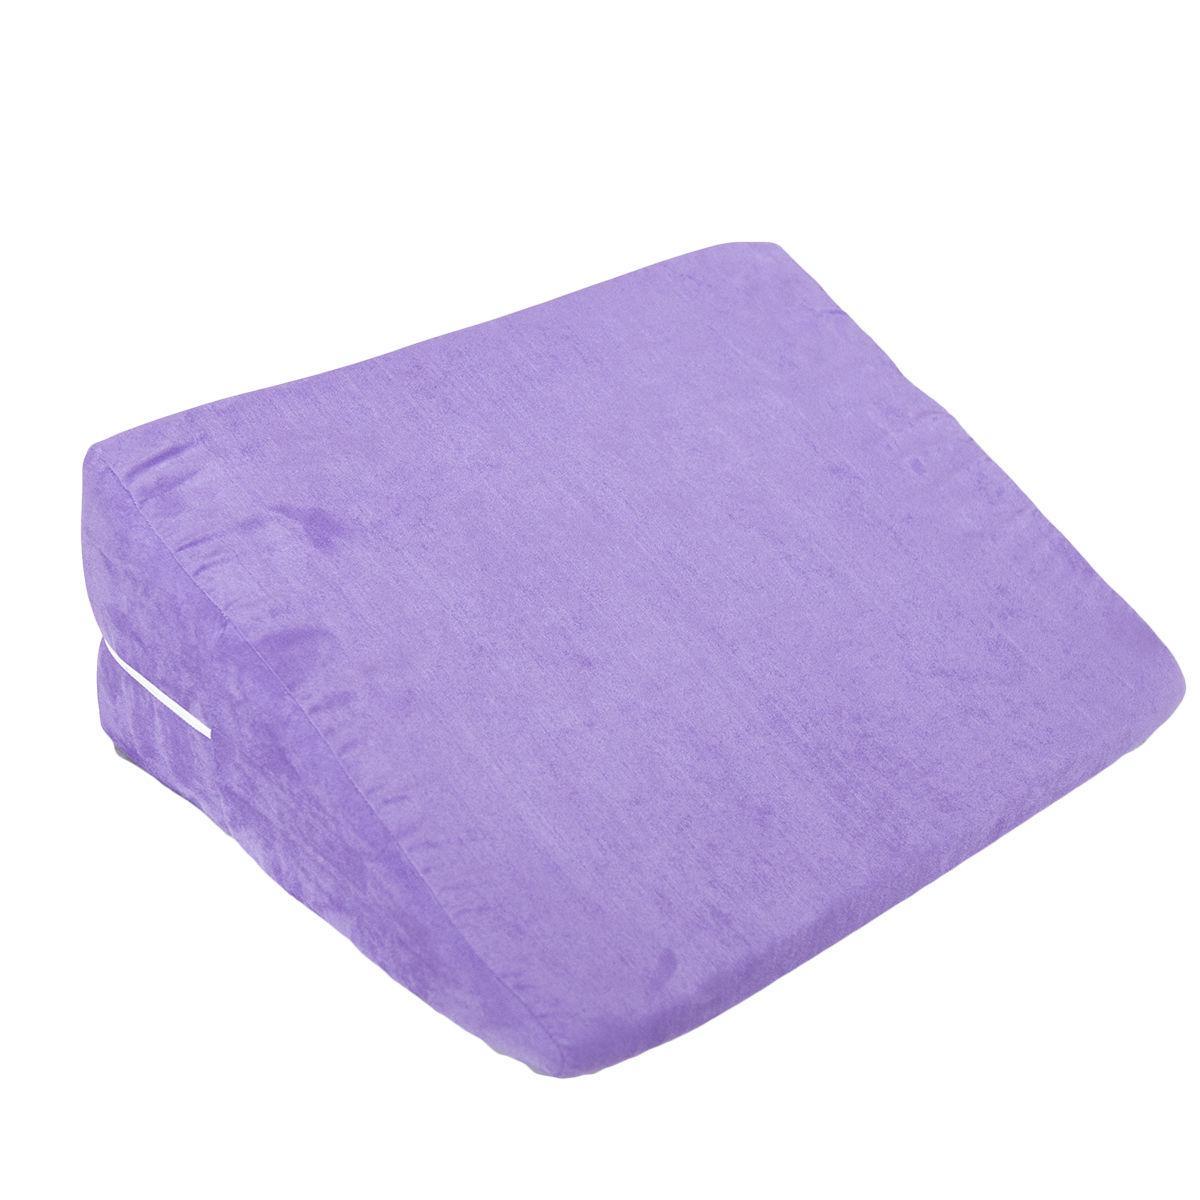 Couple Game Wedge Microfiber Cushion Foam Sex Pillow Position Aid Ramp Bolster P AU65